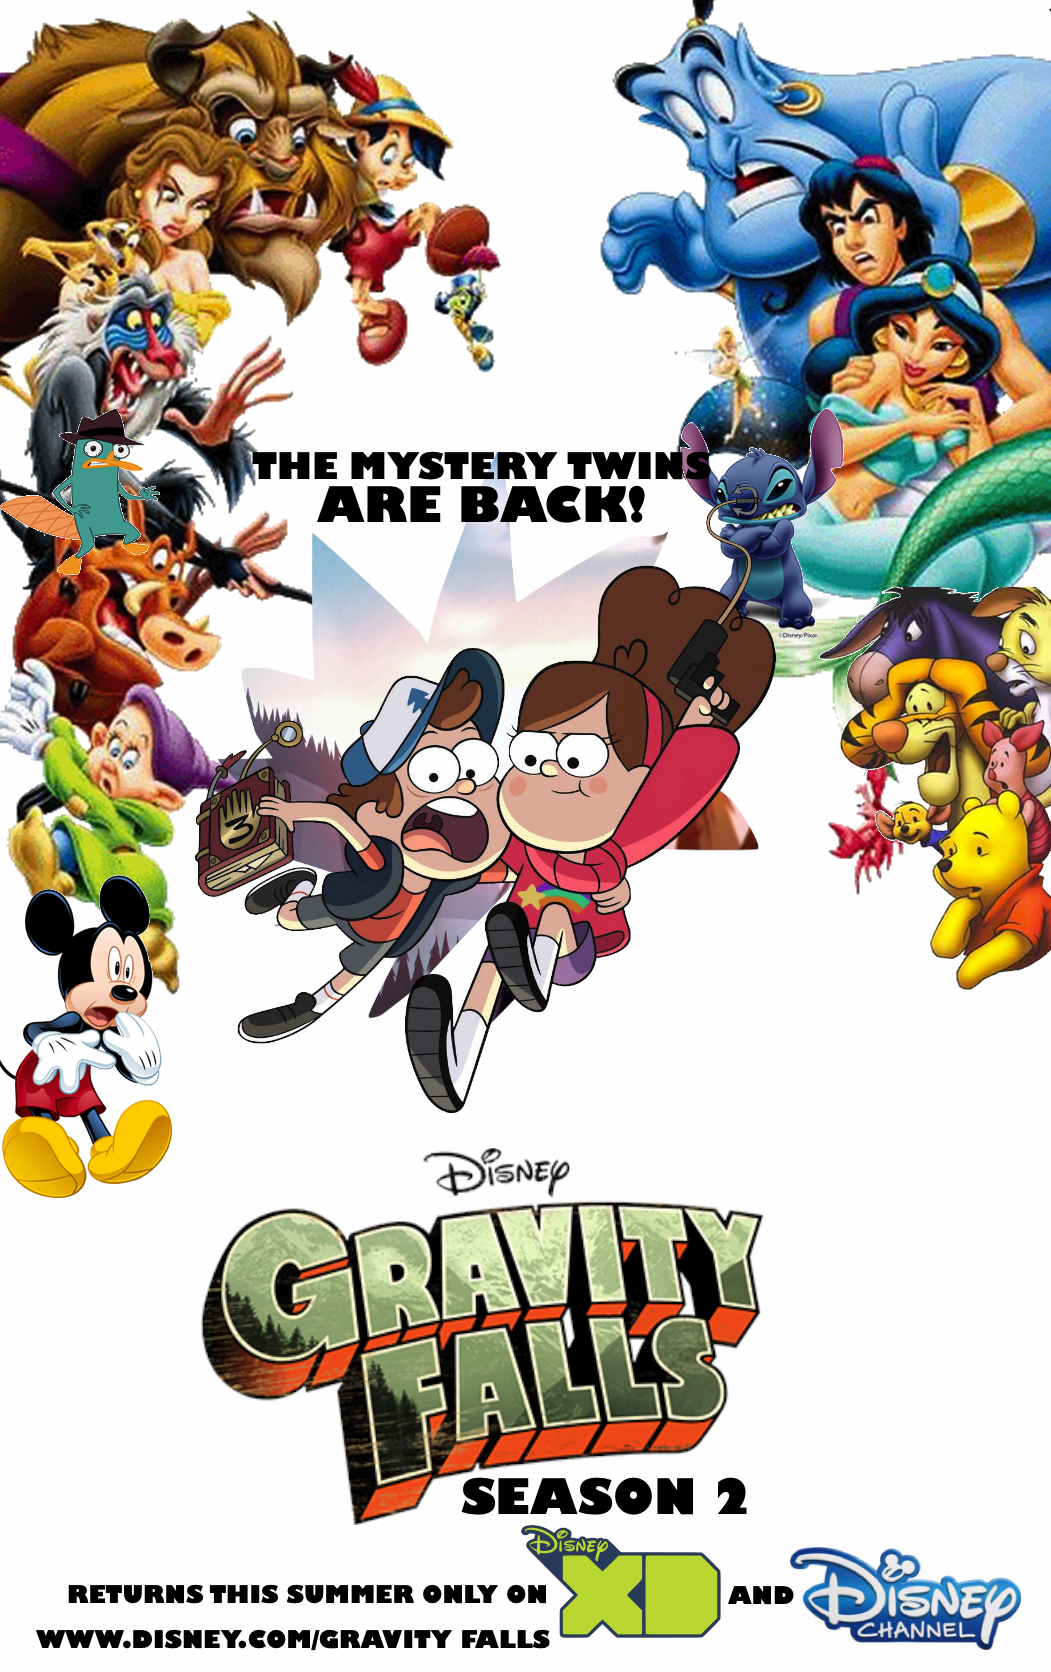 gravity falls s2 poster by edogg8181804 on deviantart